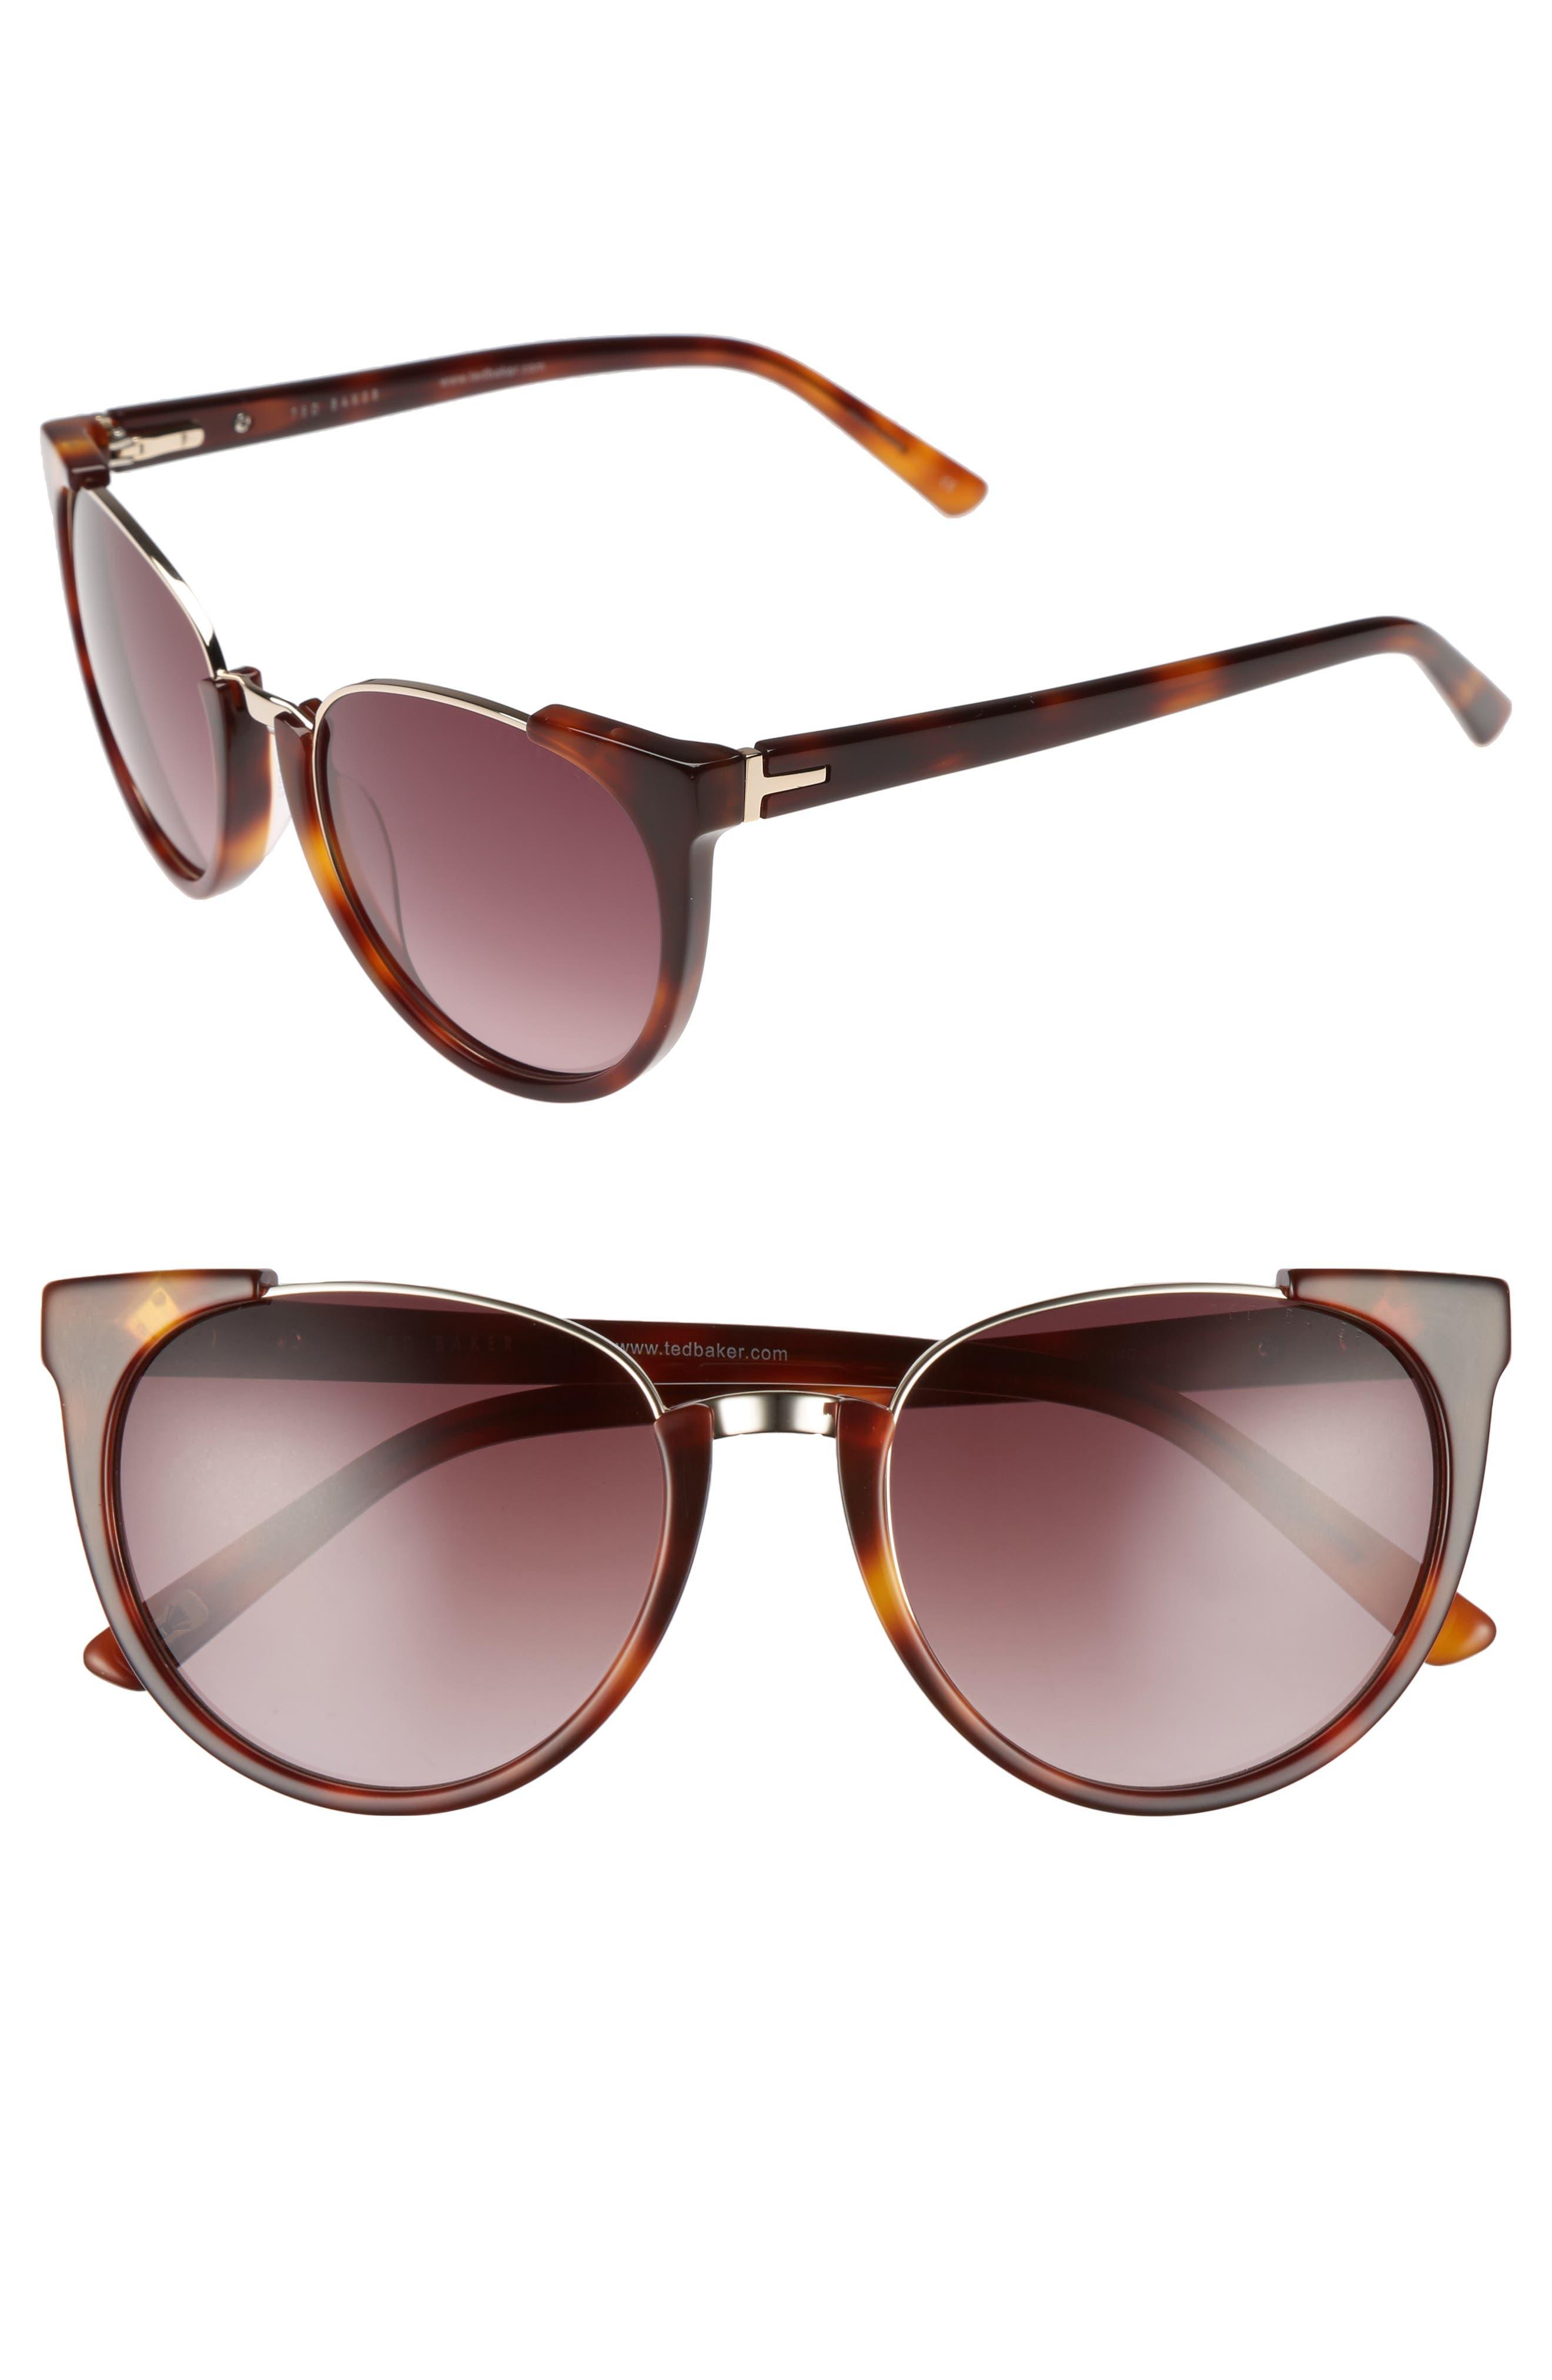 53mm Modified Oval Sunglasses,                         Main,                         color, TORTOISE